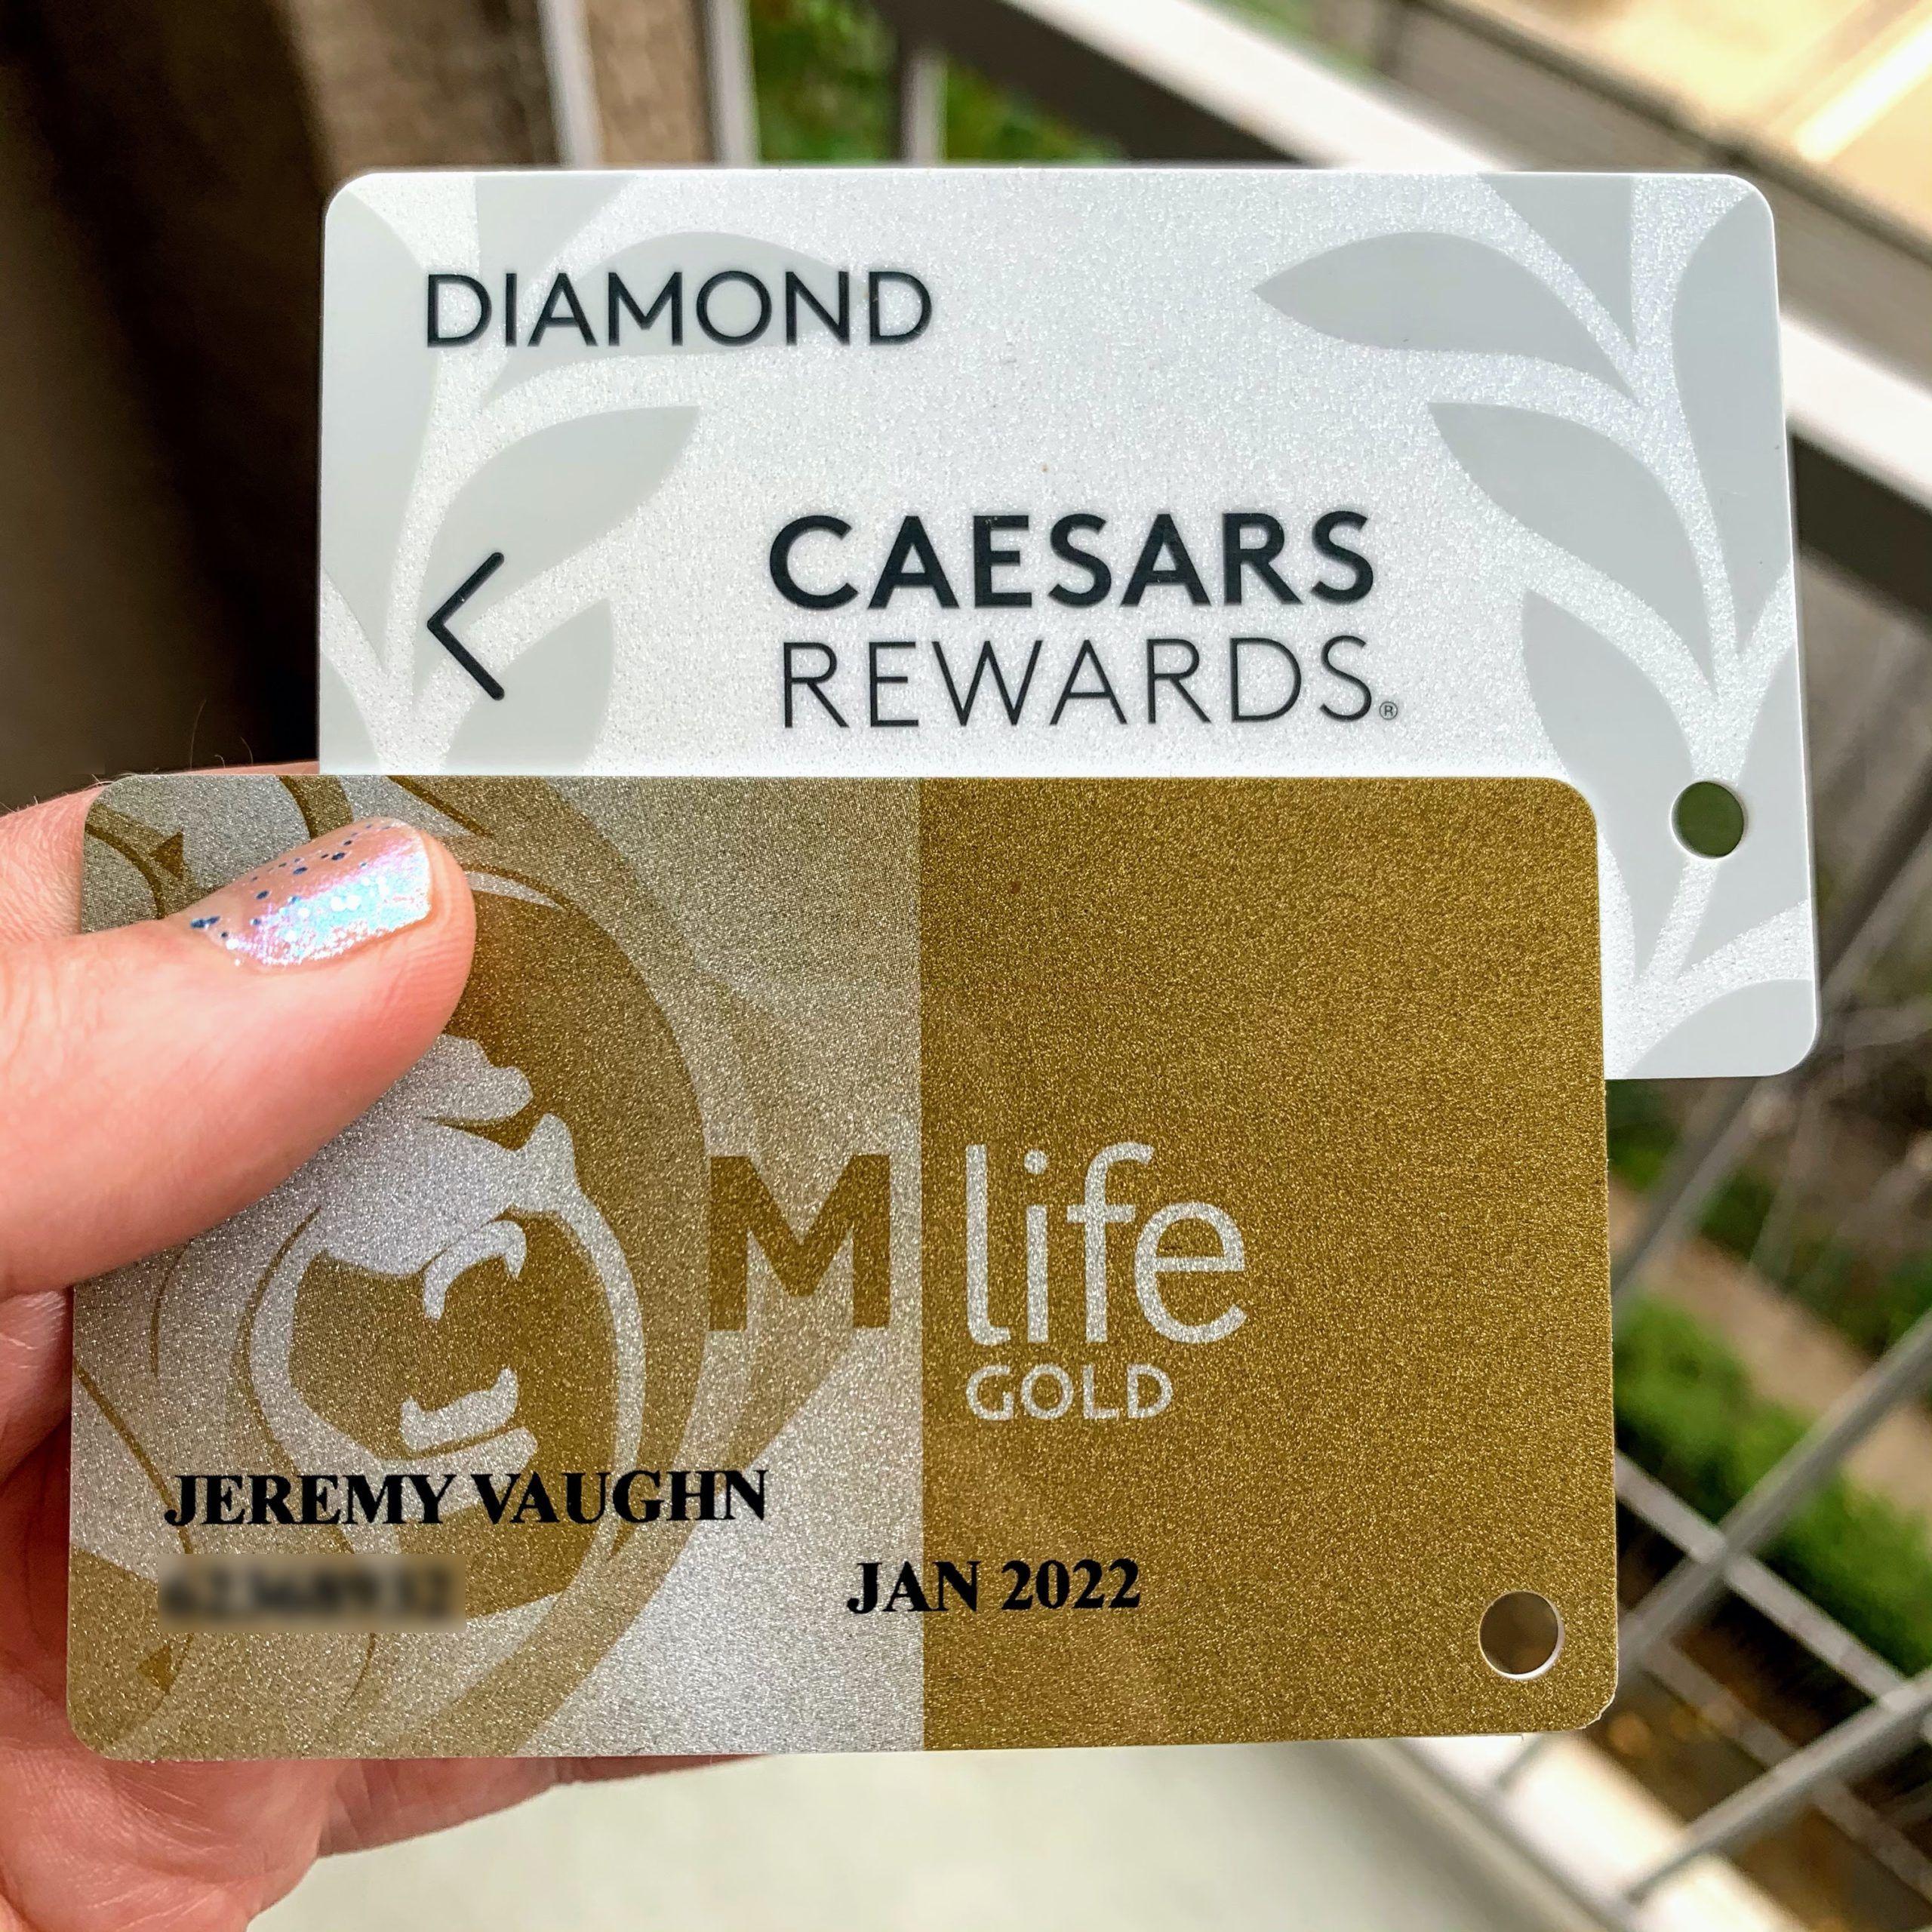 Easy Caesars M Life Status Match And Then Hyatt Explorist Status Life Status Credit Card Deals Chase Ultimate Rewards